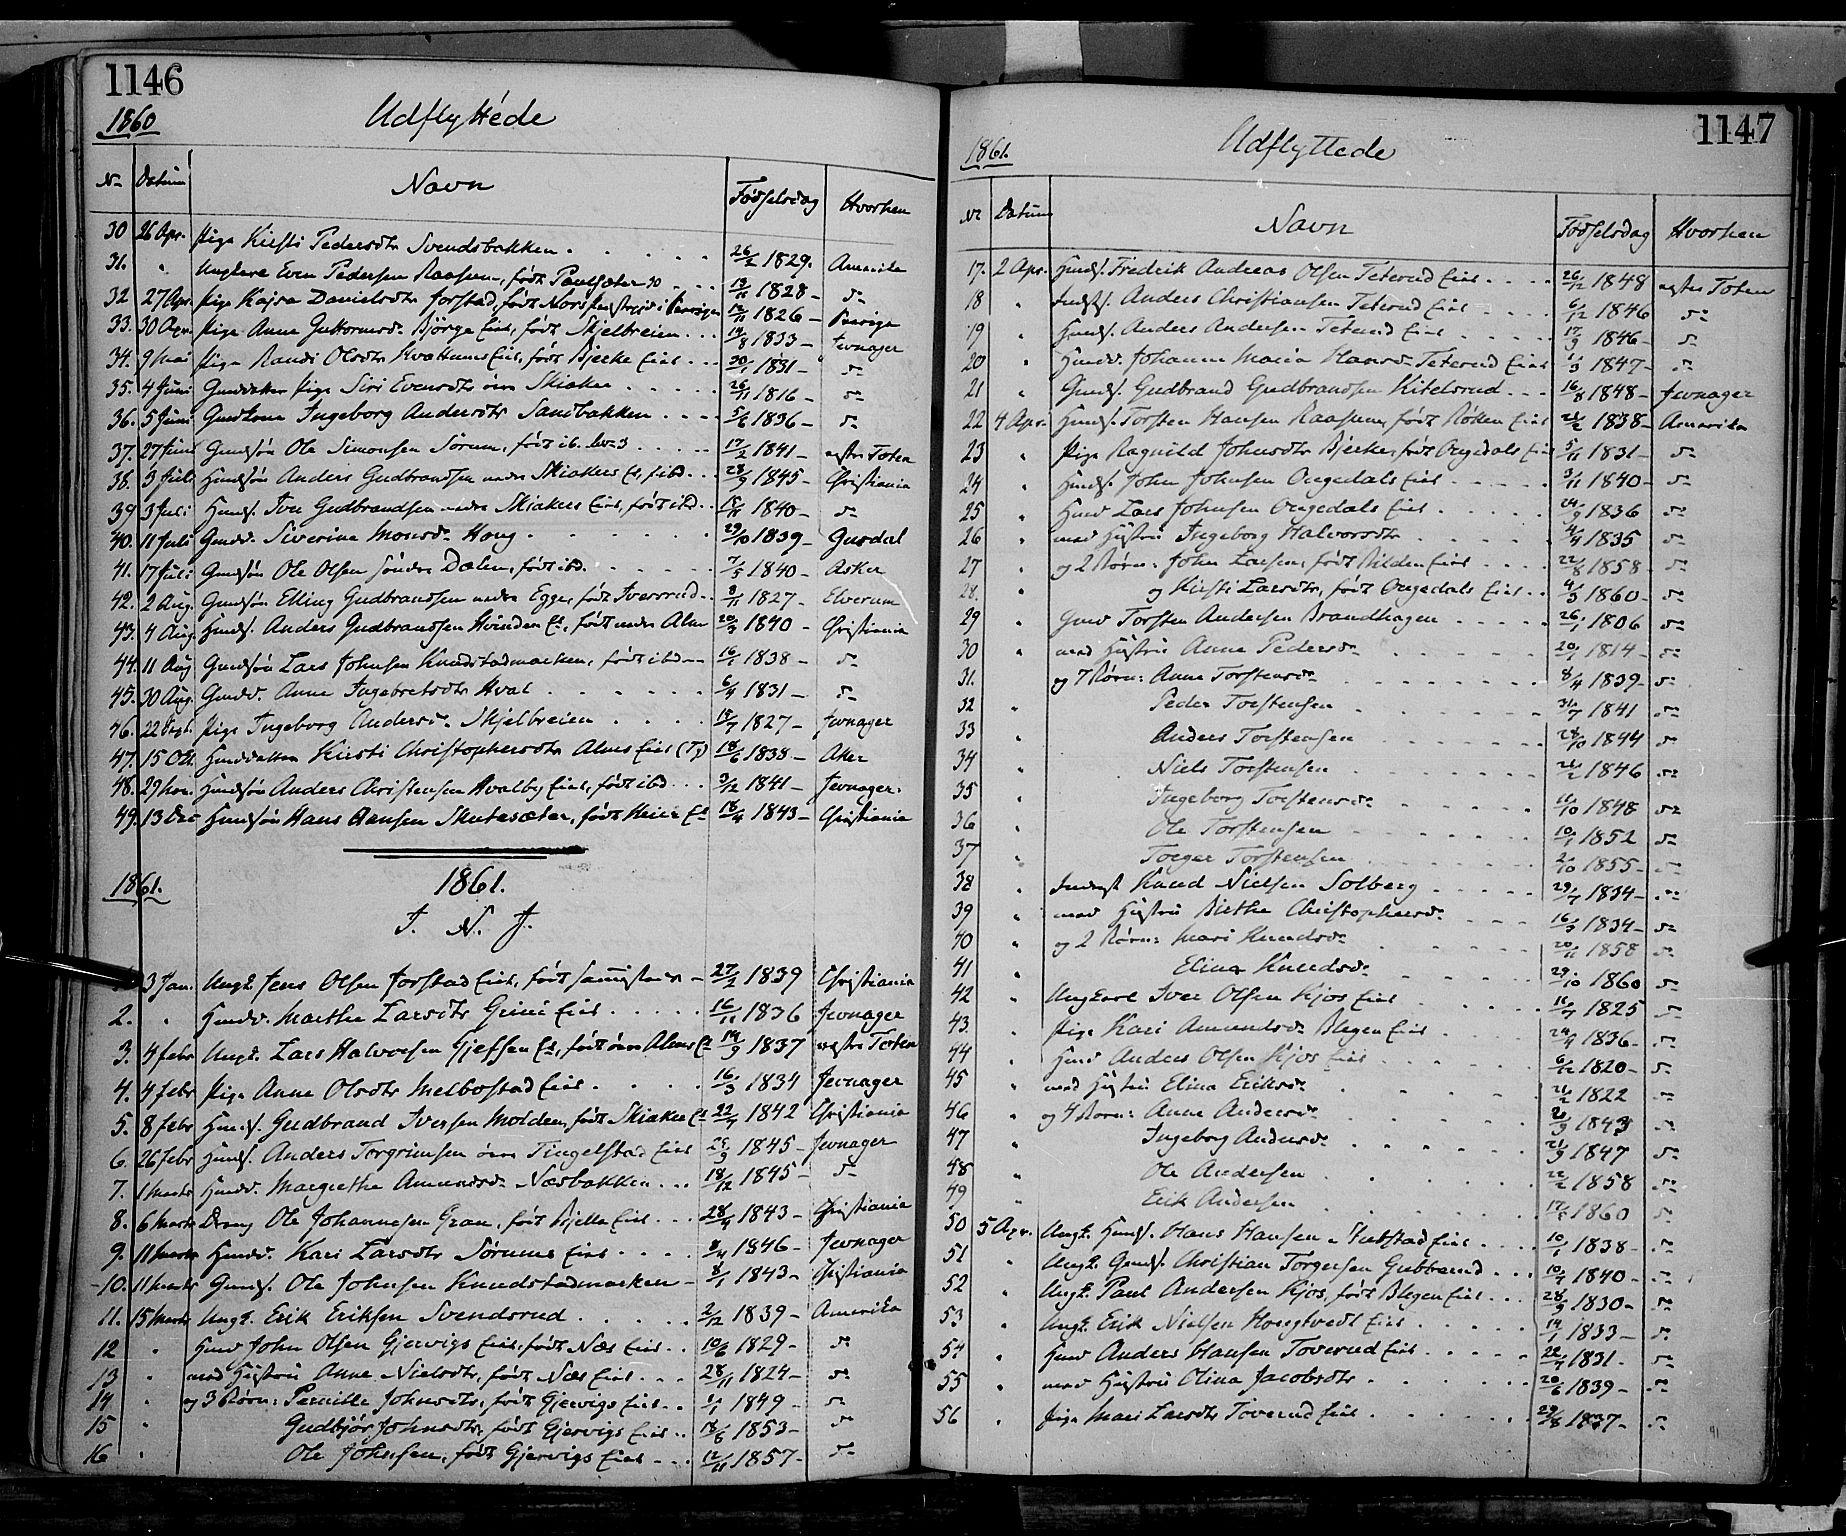 SAH, Gran prestekontor, Ministerialbok nr. 12, 1856-1874, s. 1146-1147